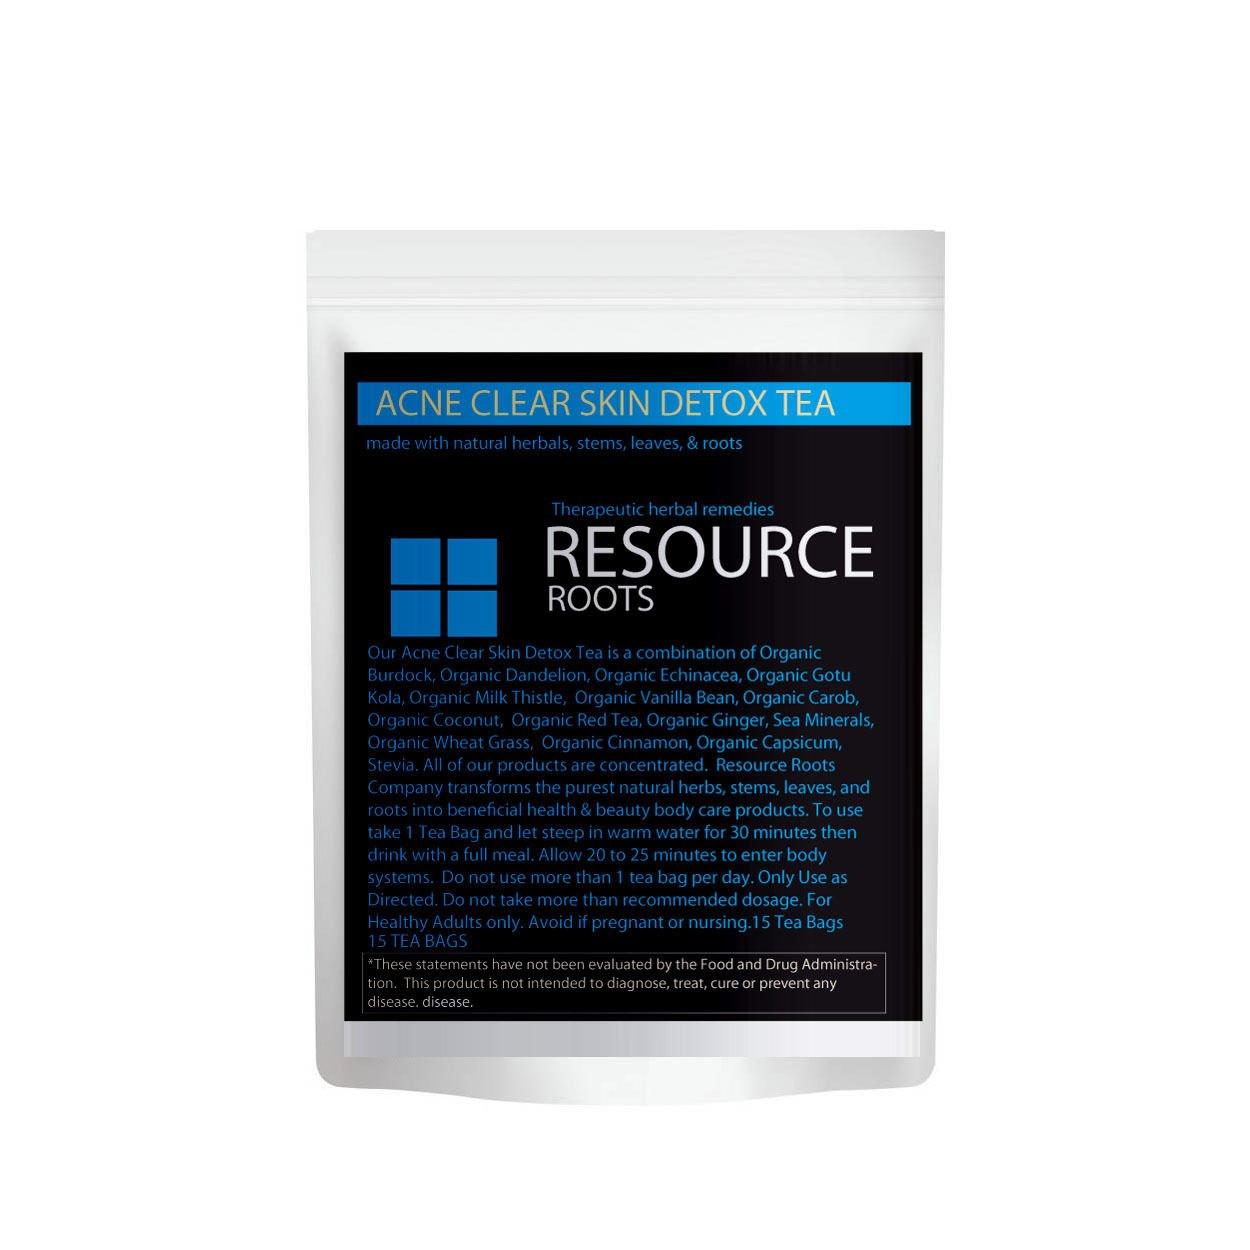 Acne Clear Skin Detox Tea